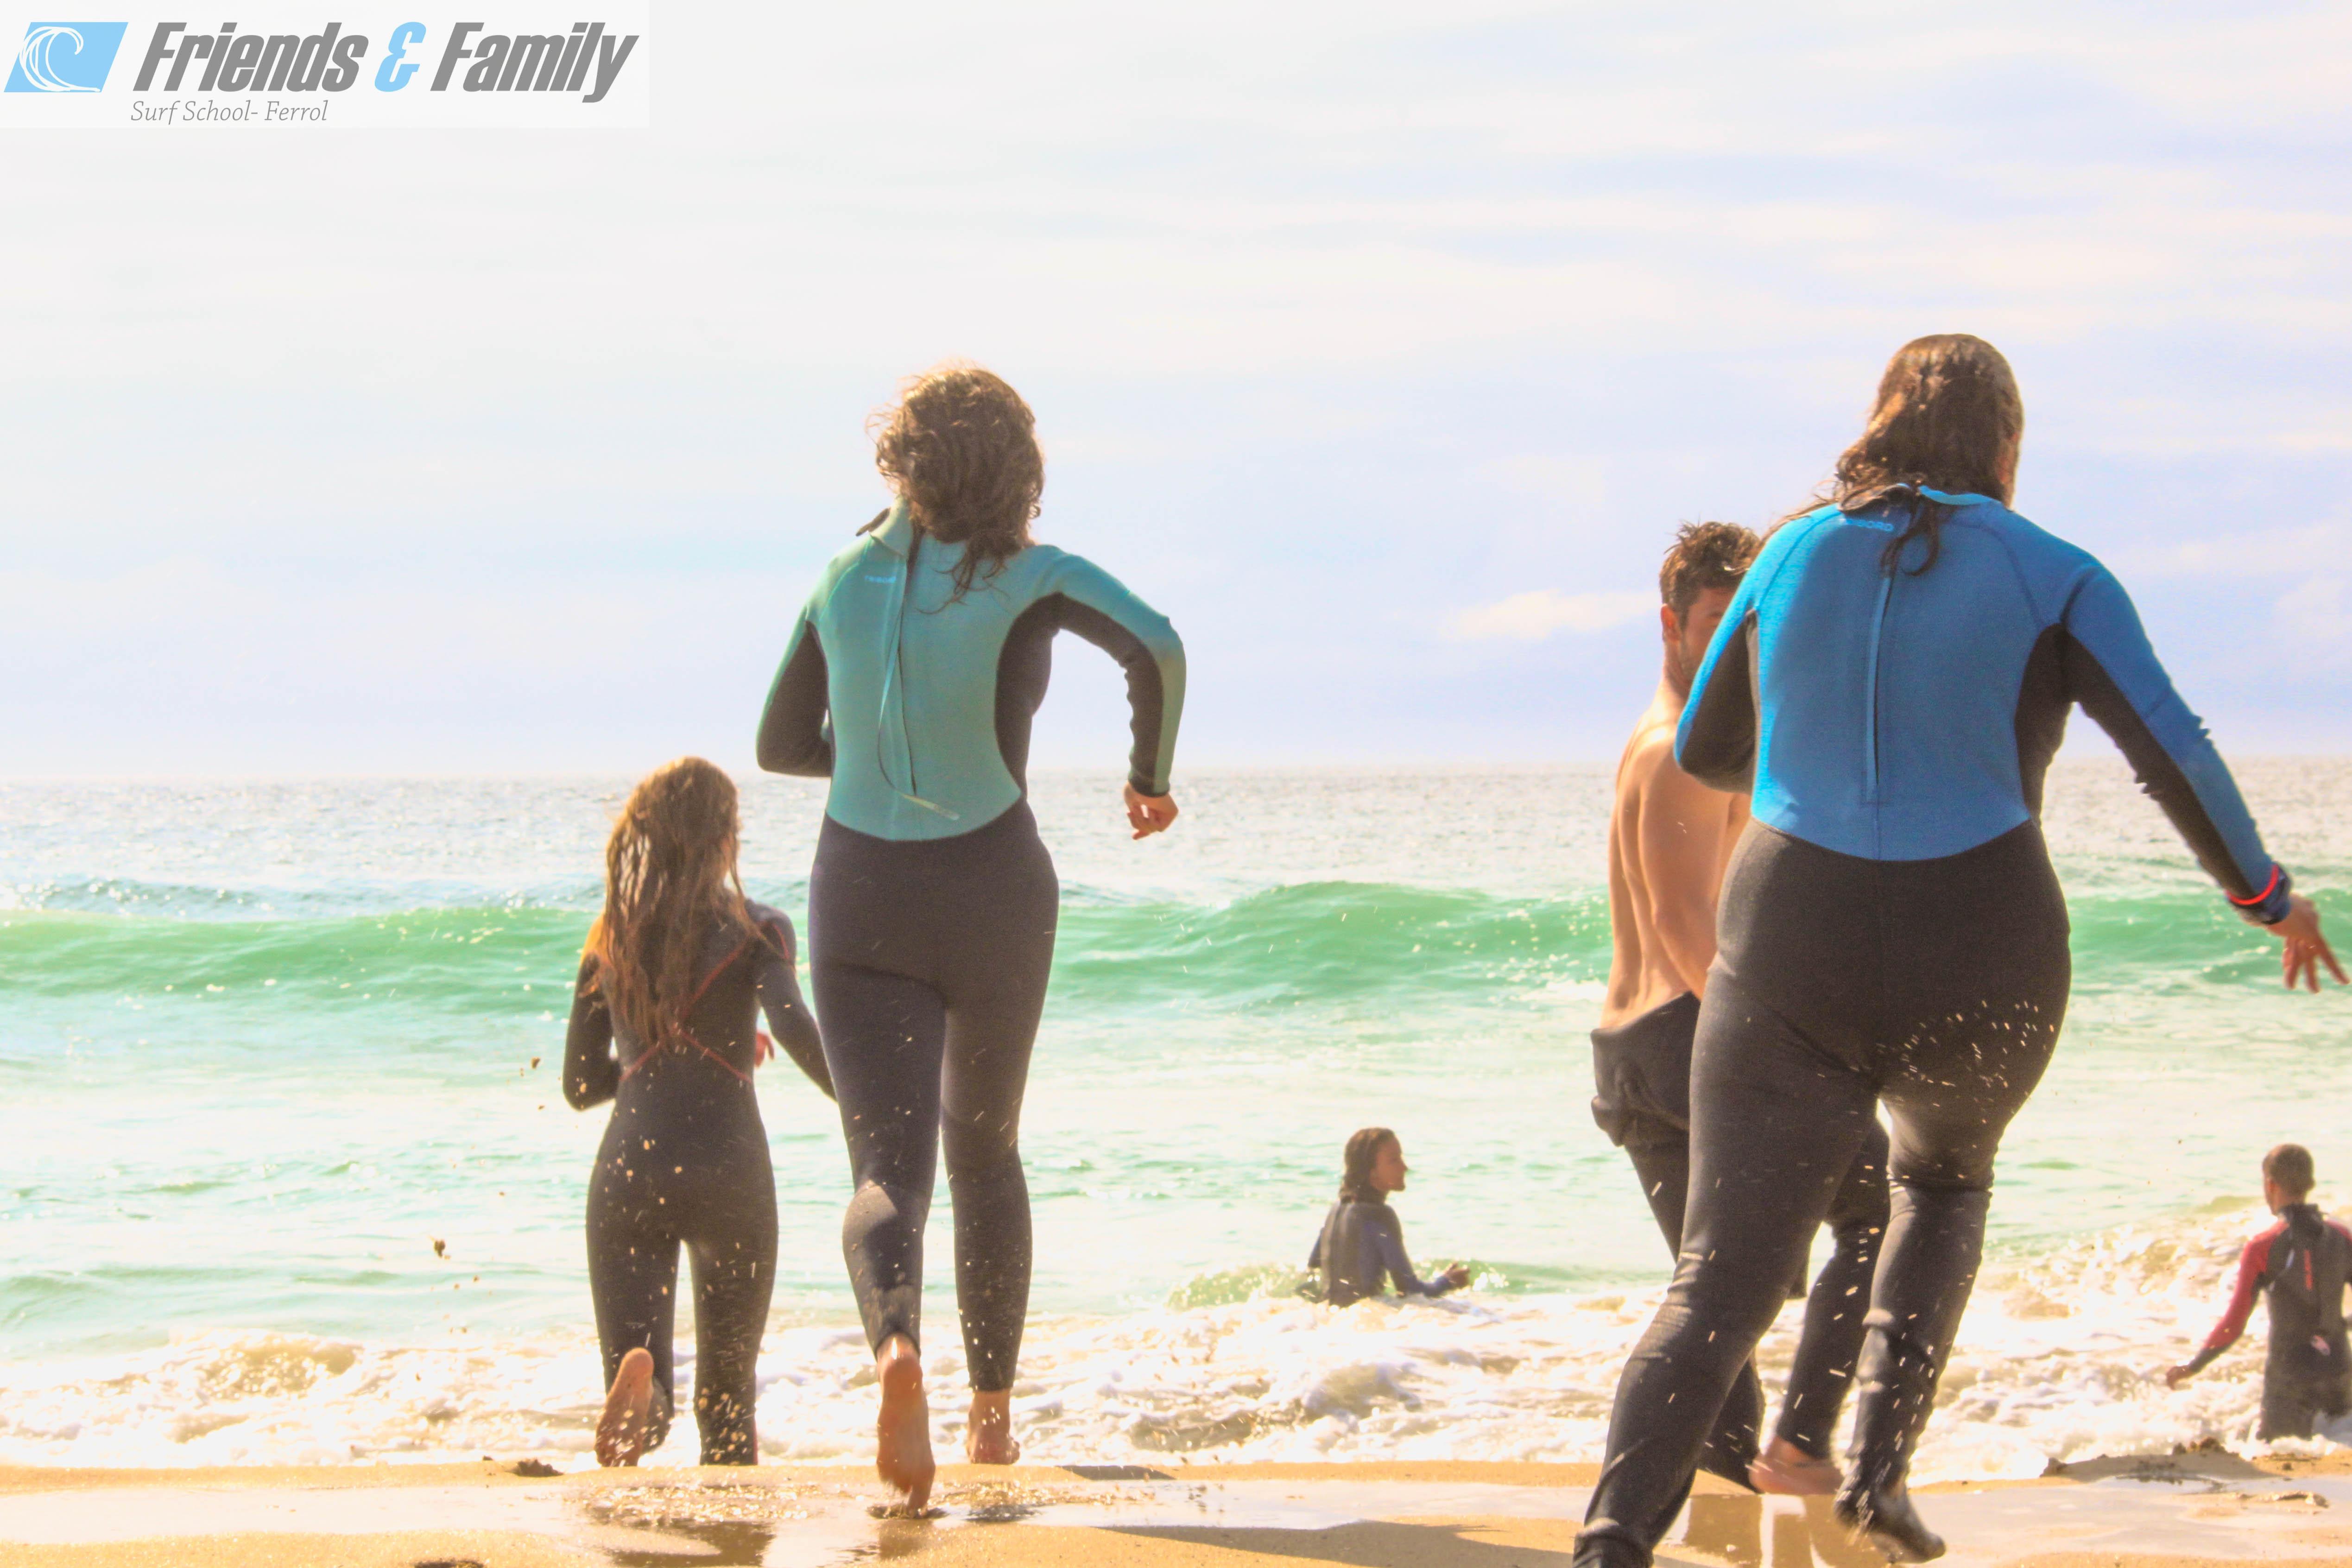 F&F Surf School